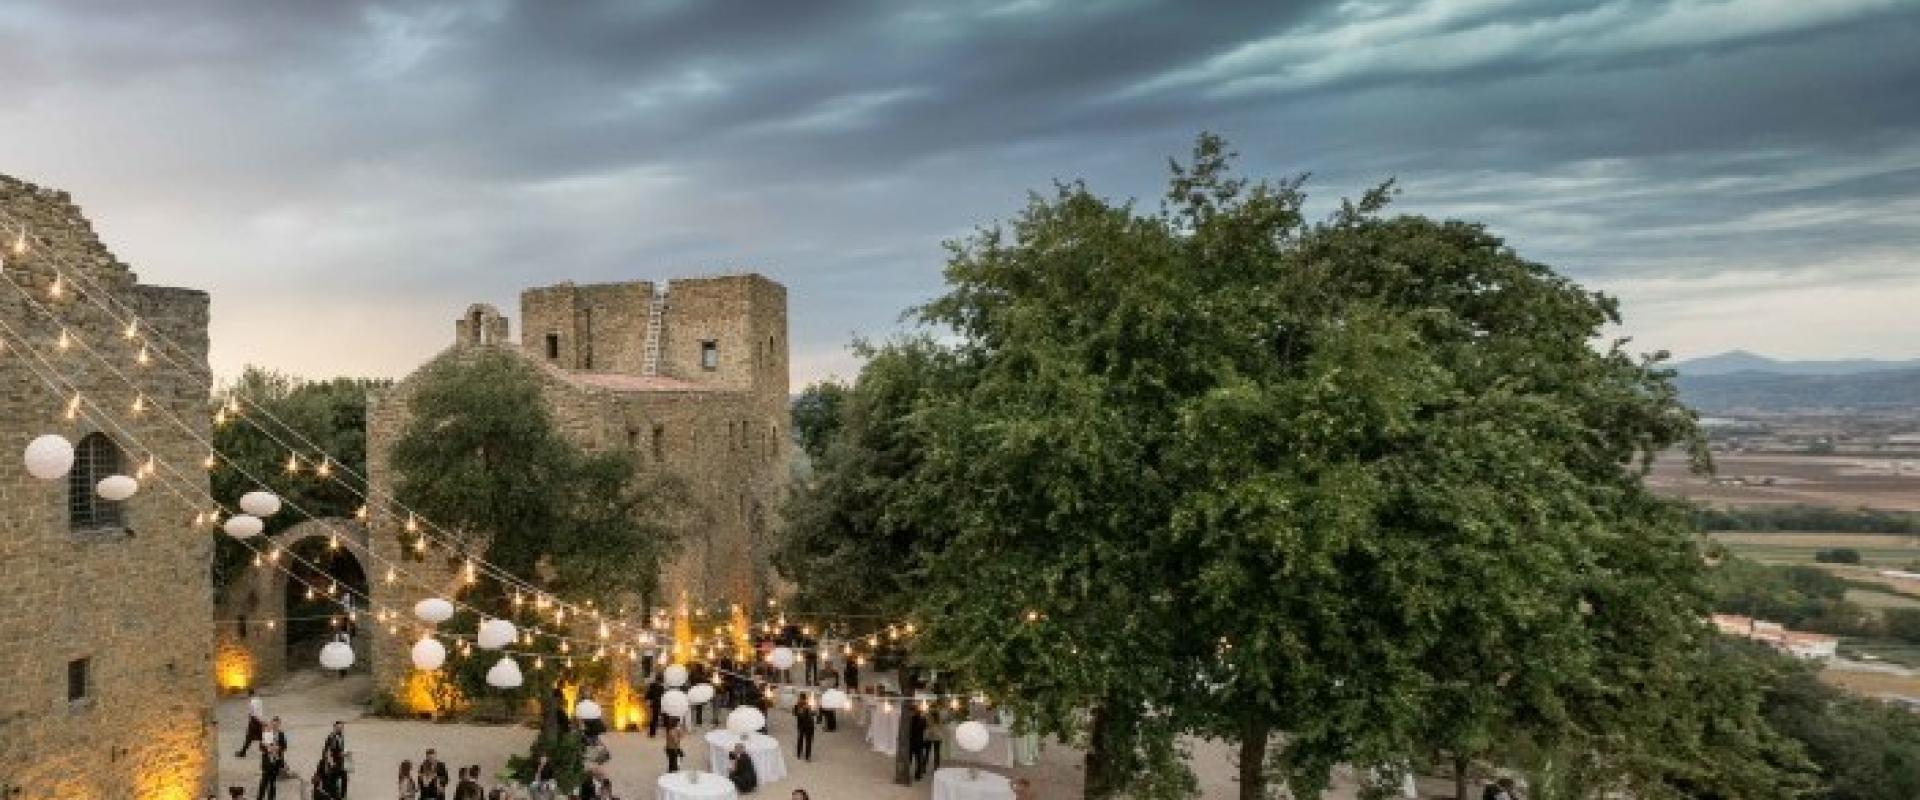 Wedding in the Borgo